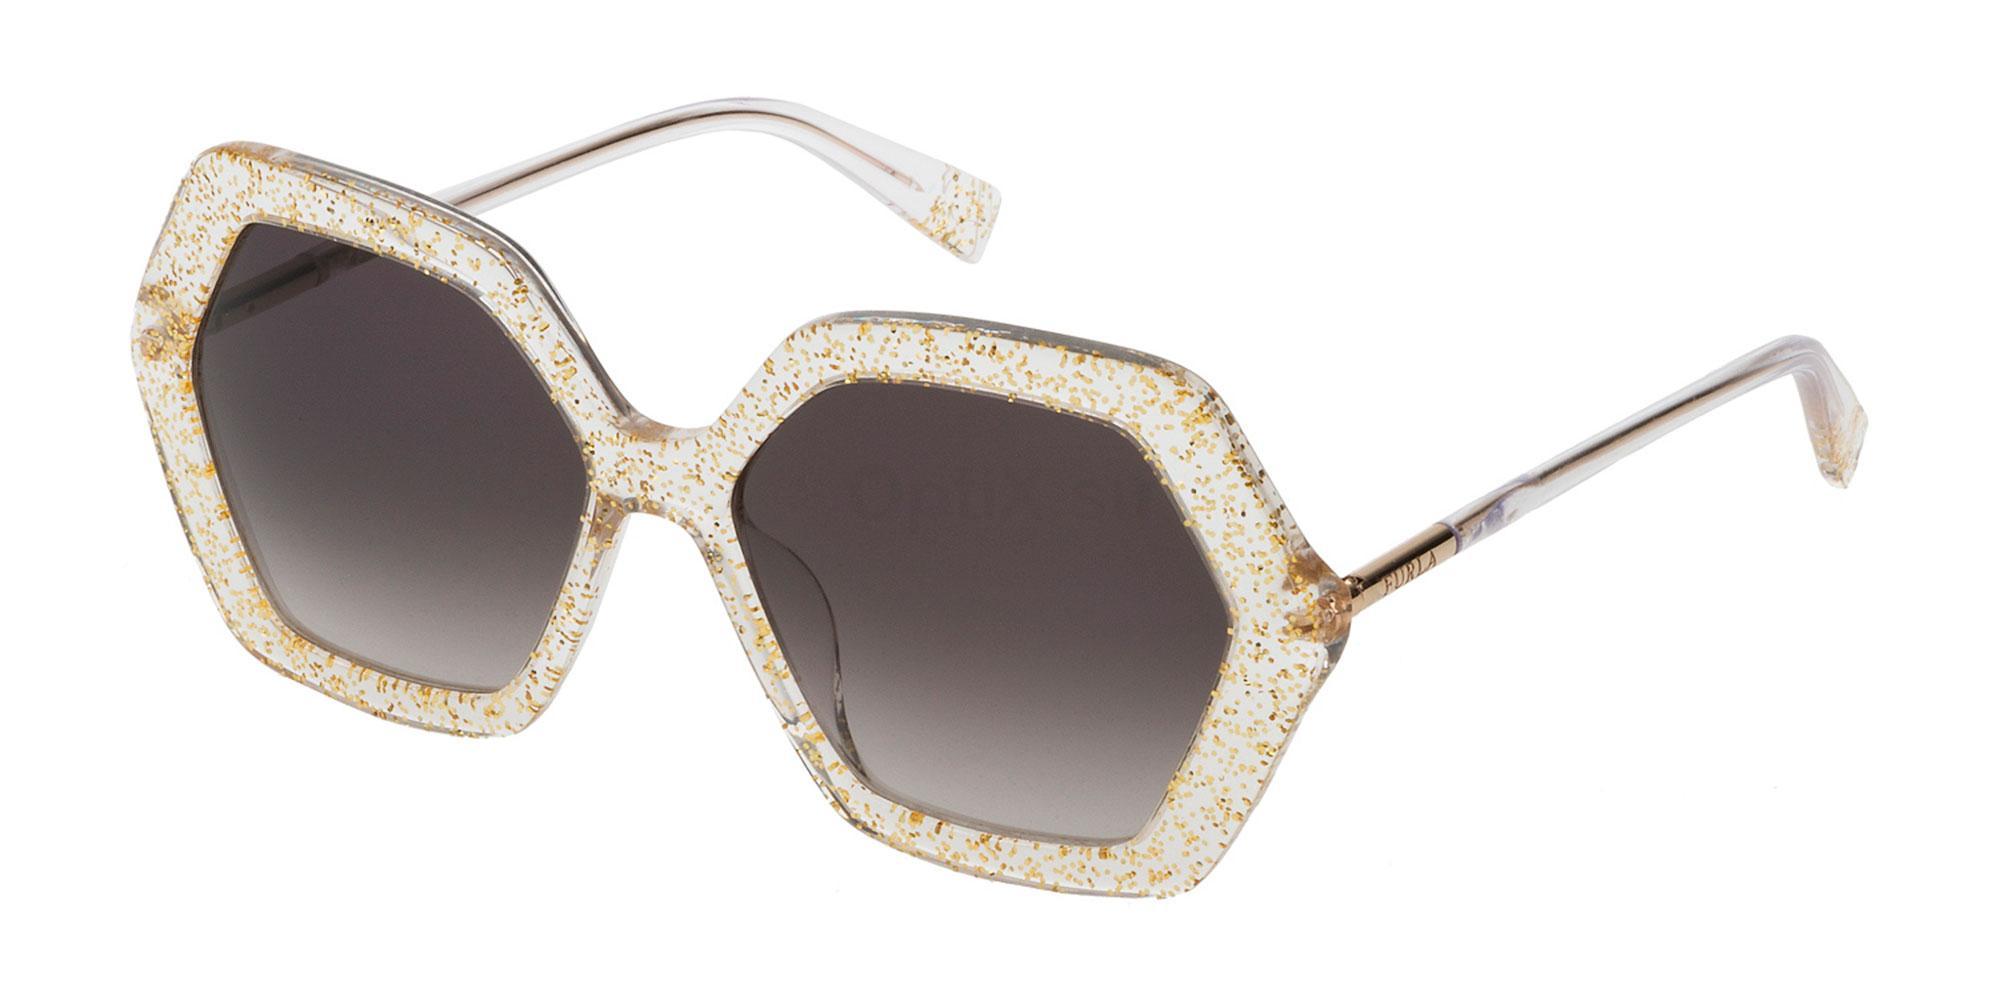 0891 SFU256 Sunglasses, Furla